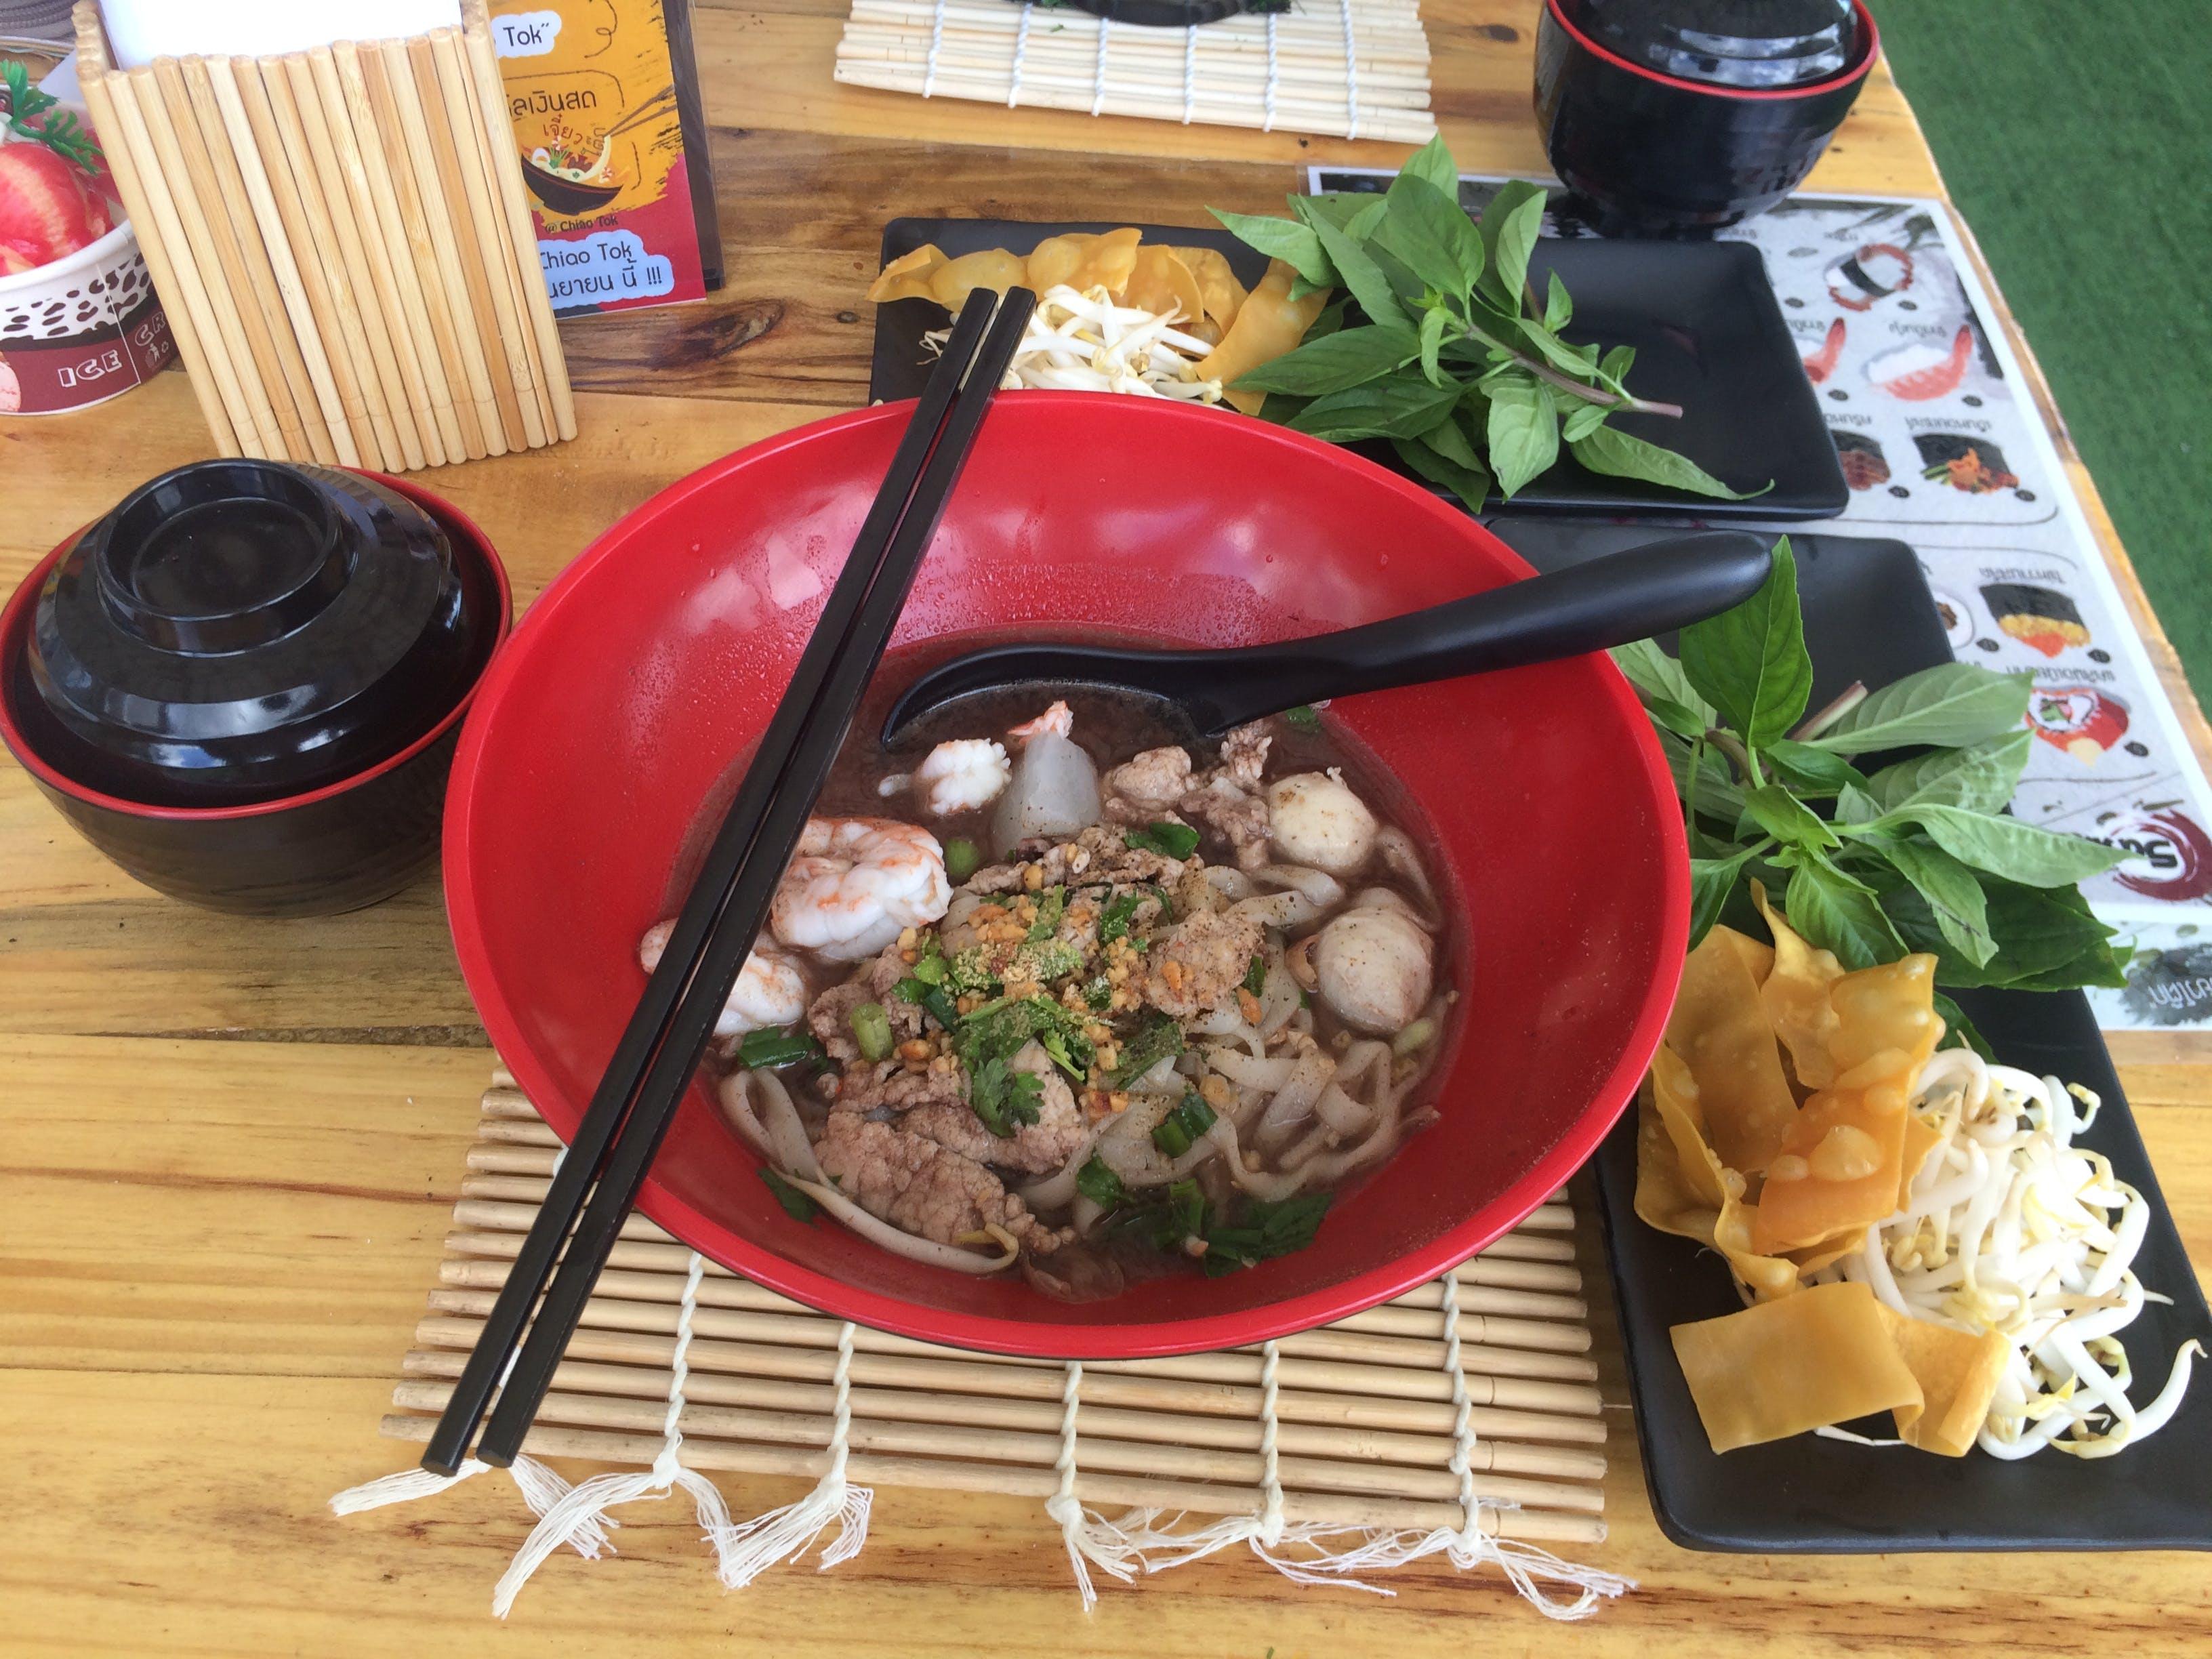 Free stock photo of thai food, ก๋วยเตี๋ยว, อาหารไทย